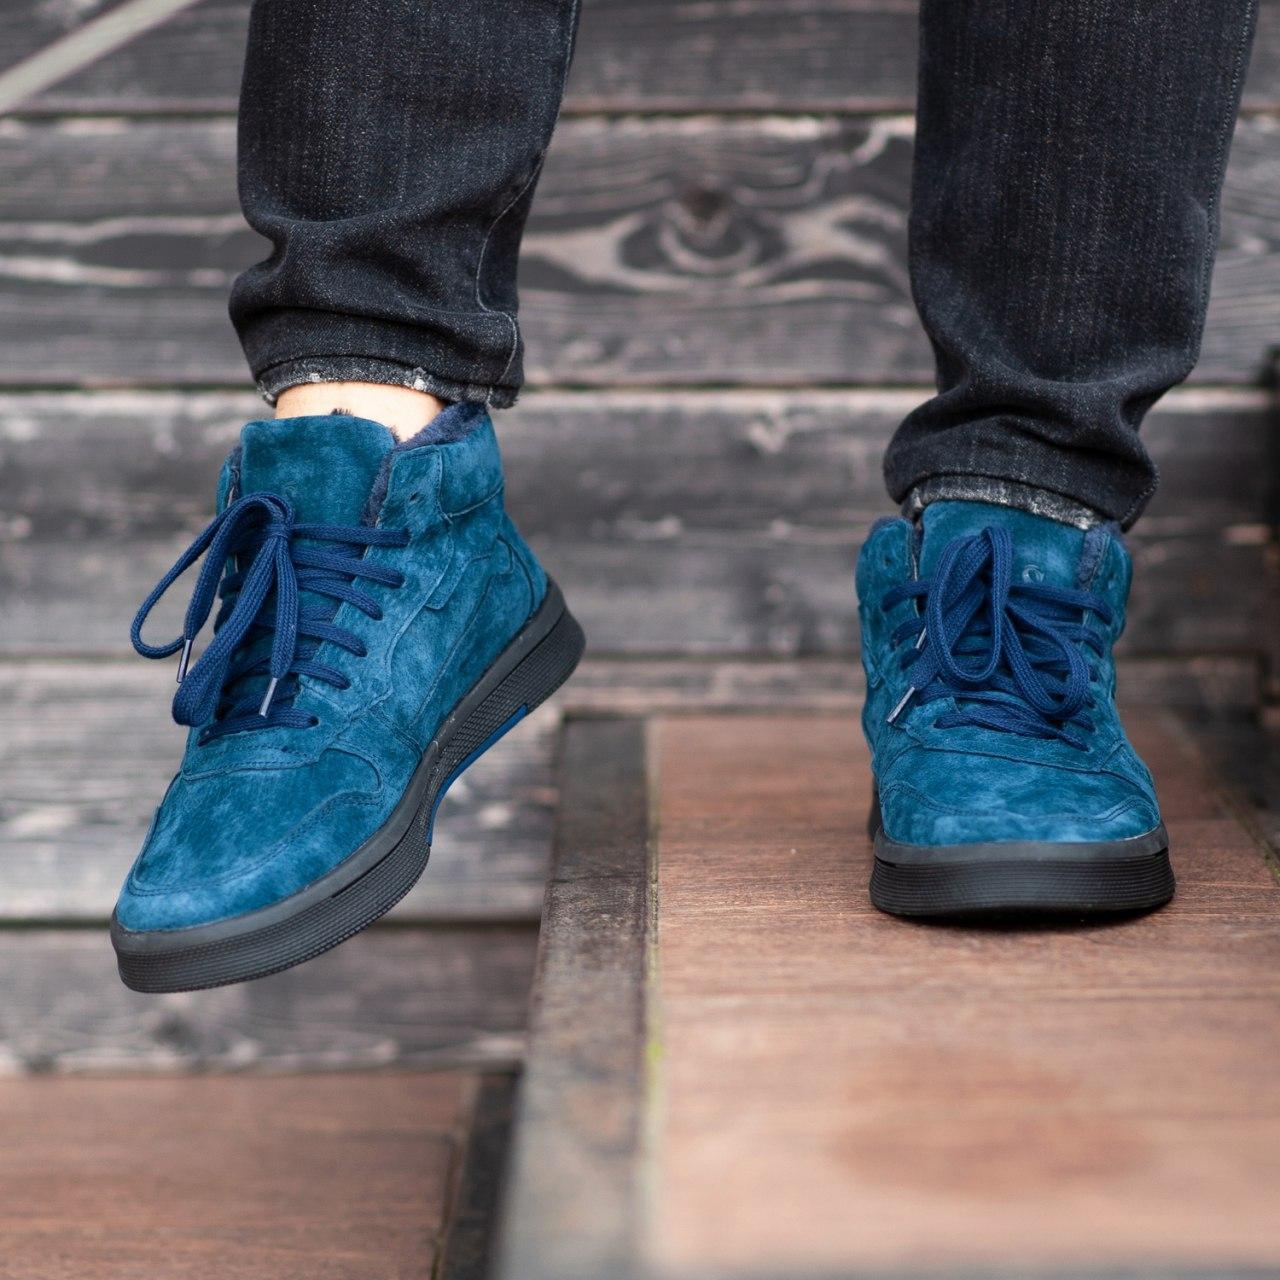 Ботинки South Oriole blue - фото 2